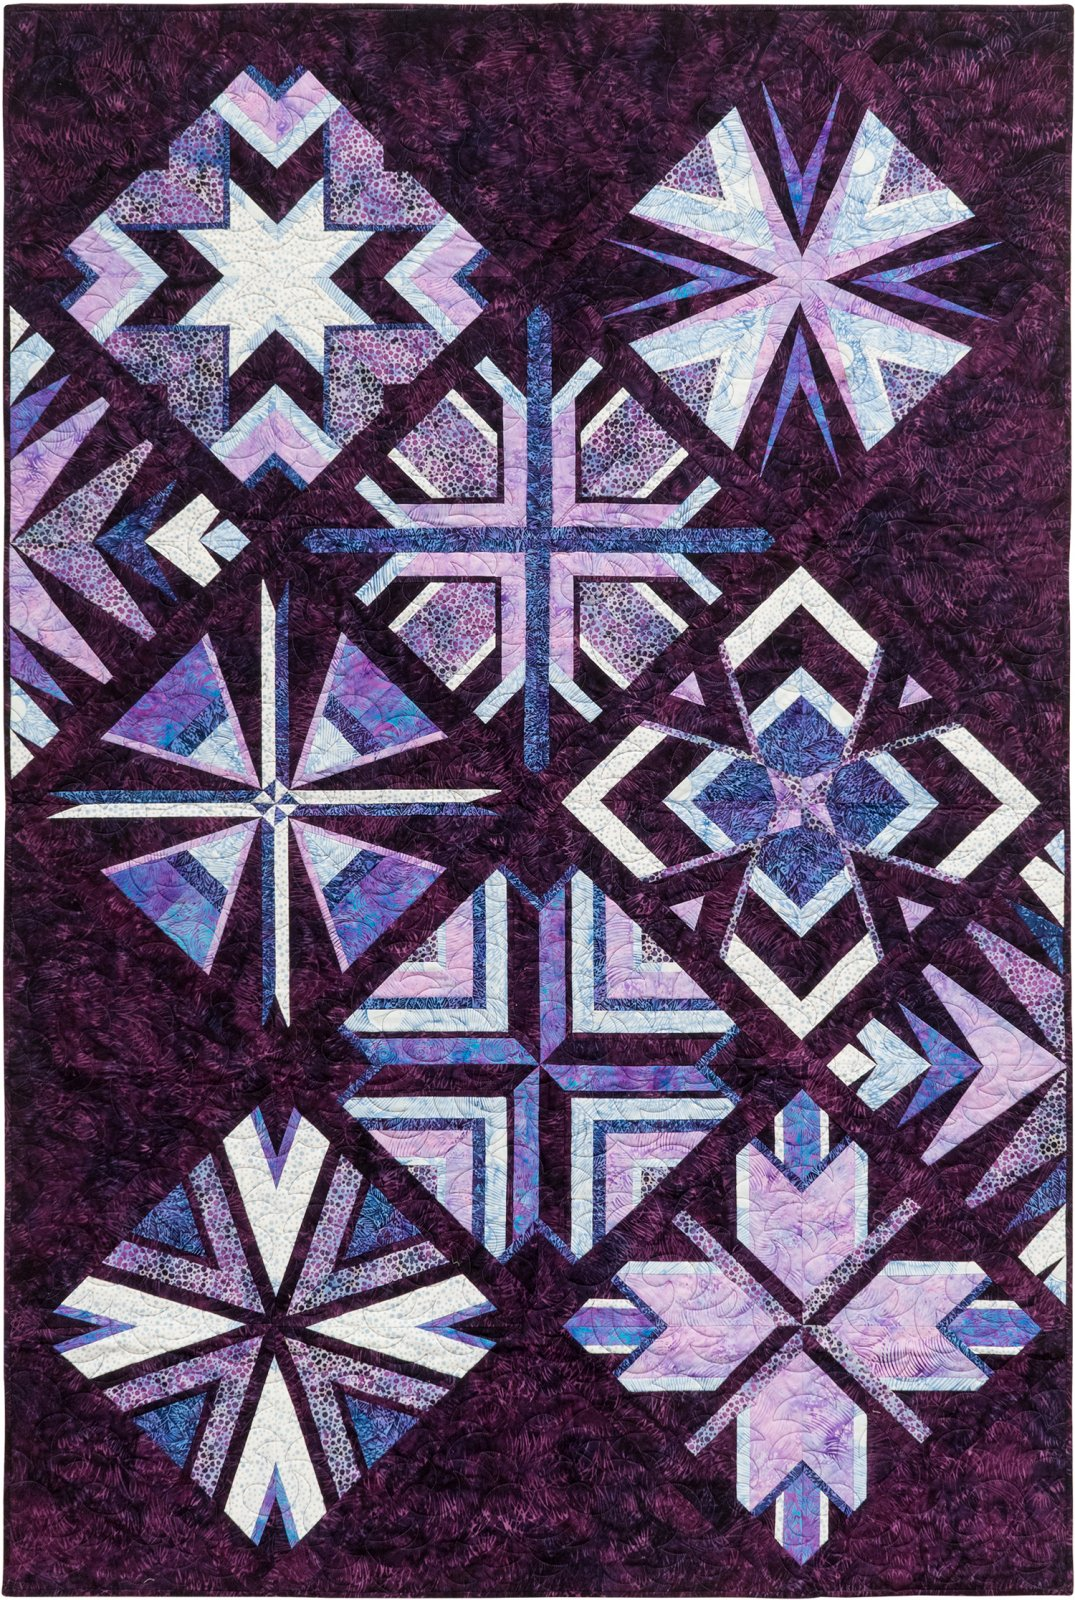 Elementz Block of the Month in Lavender Fields